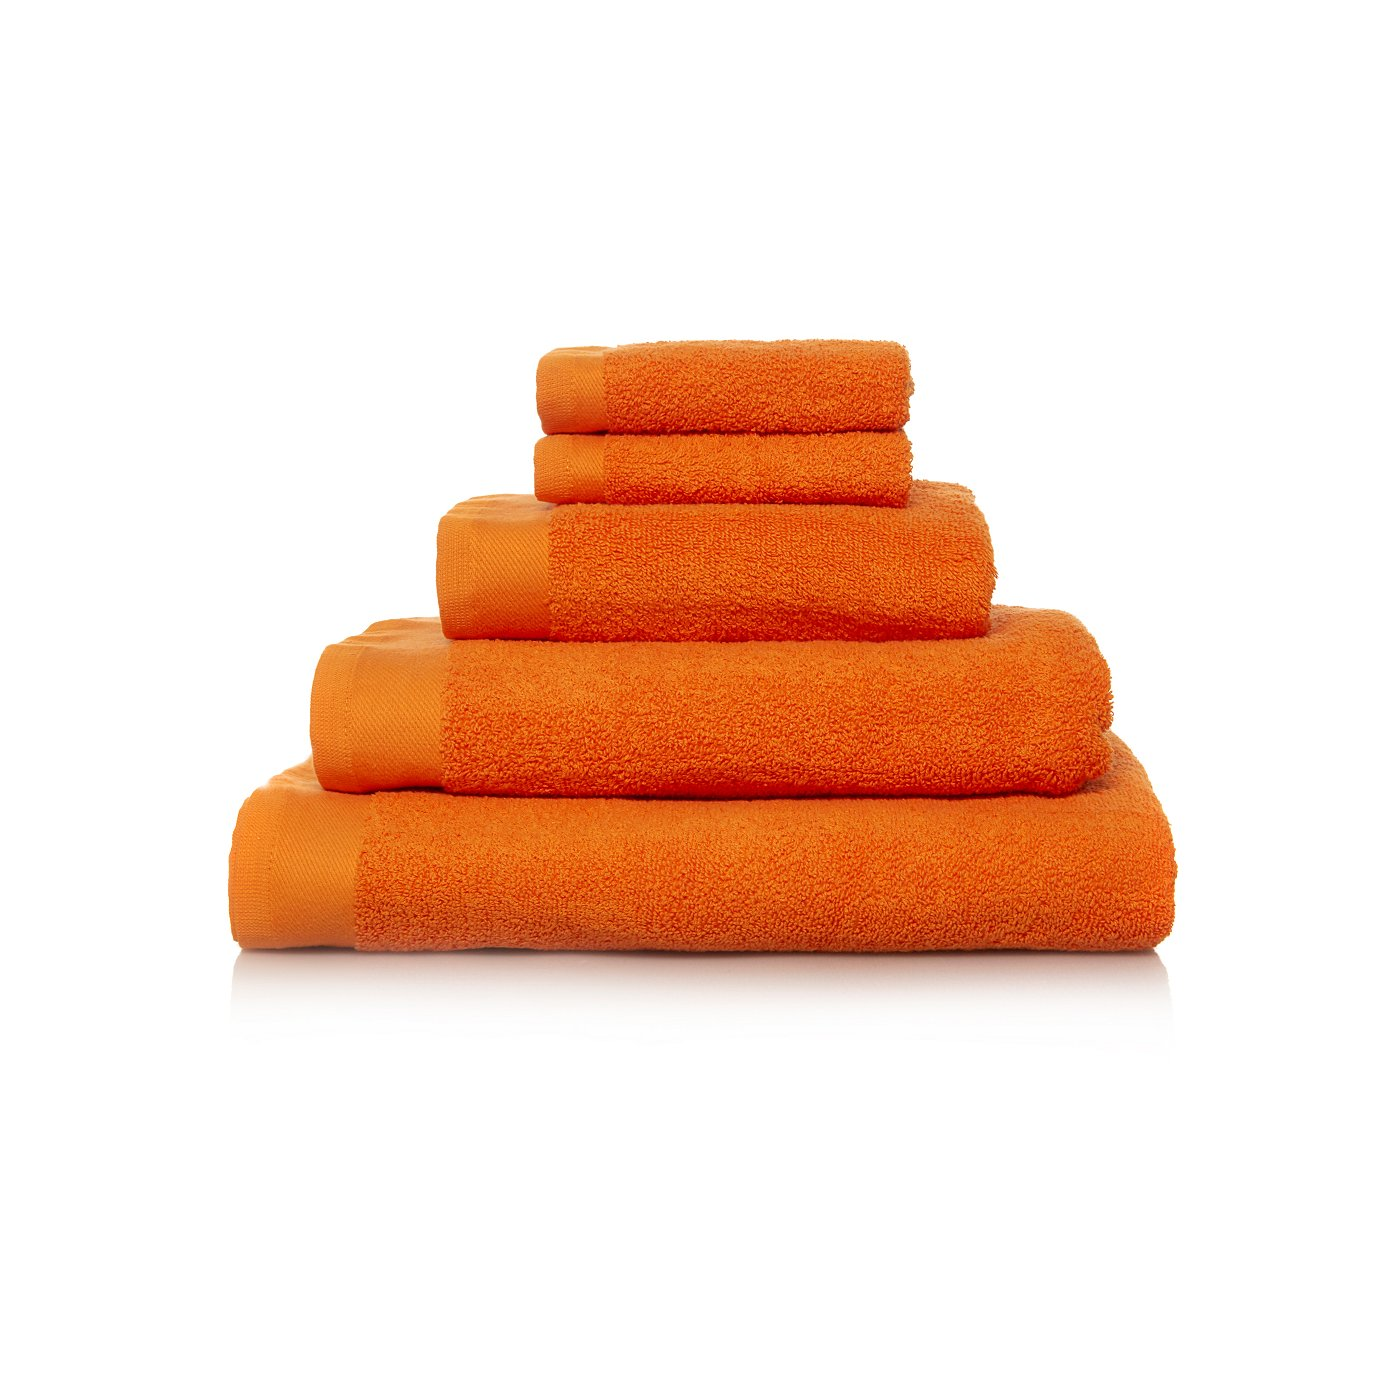 White apron asda - 100 Cotton Towel Range Zingy Orange